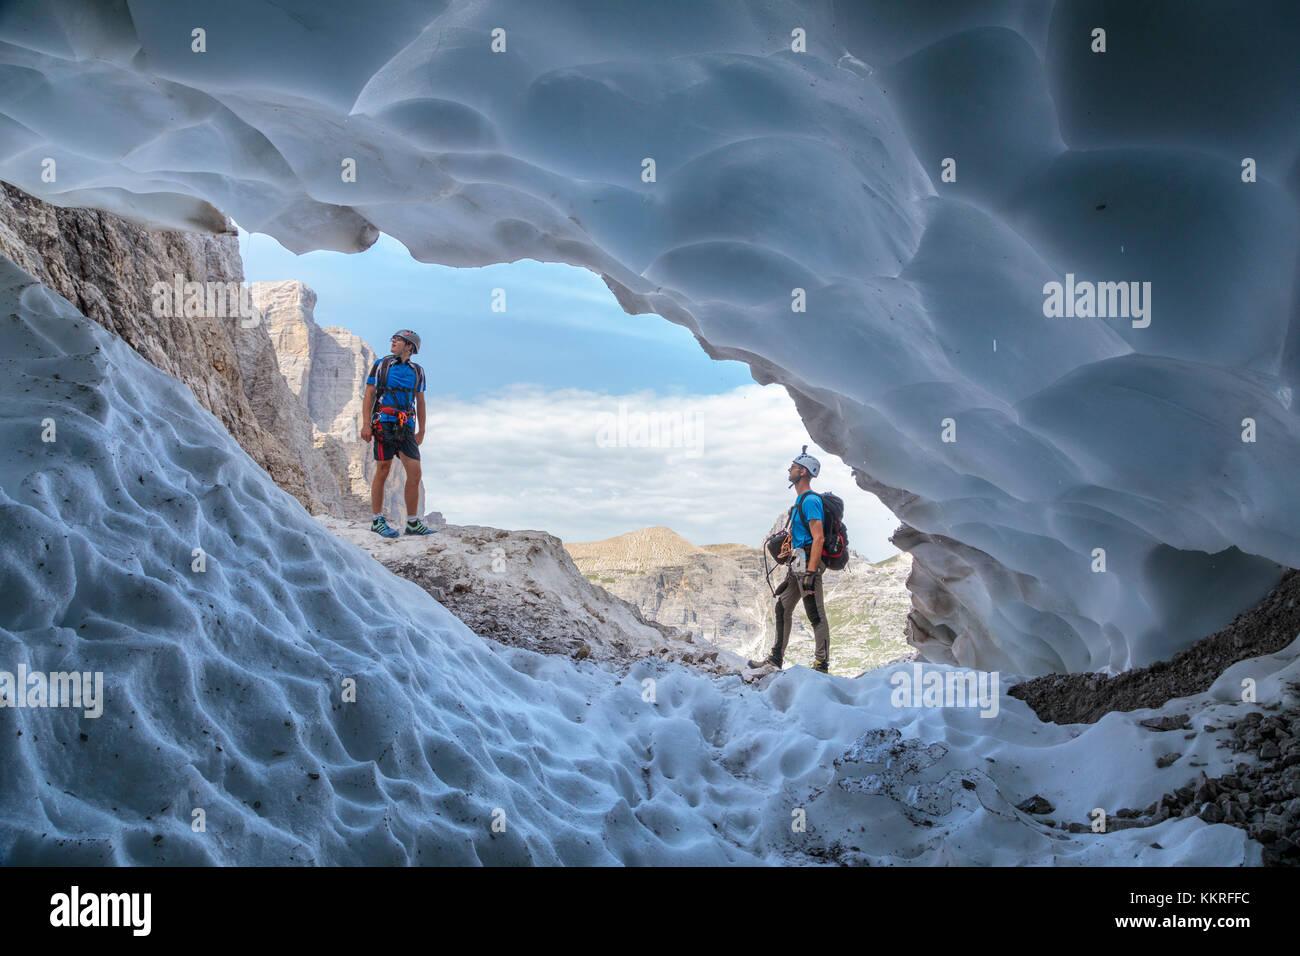 Italien, Südtirol, Meraner Land, Sexten. Schnee Höhle im Sommer entlang der alpinisteig/Strada degli Alpini Stockbild